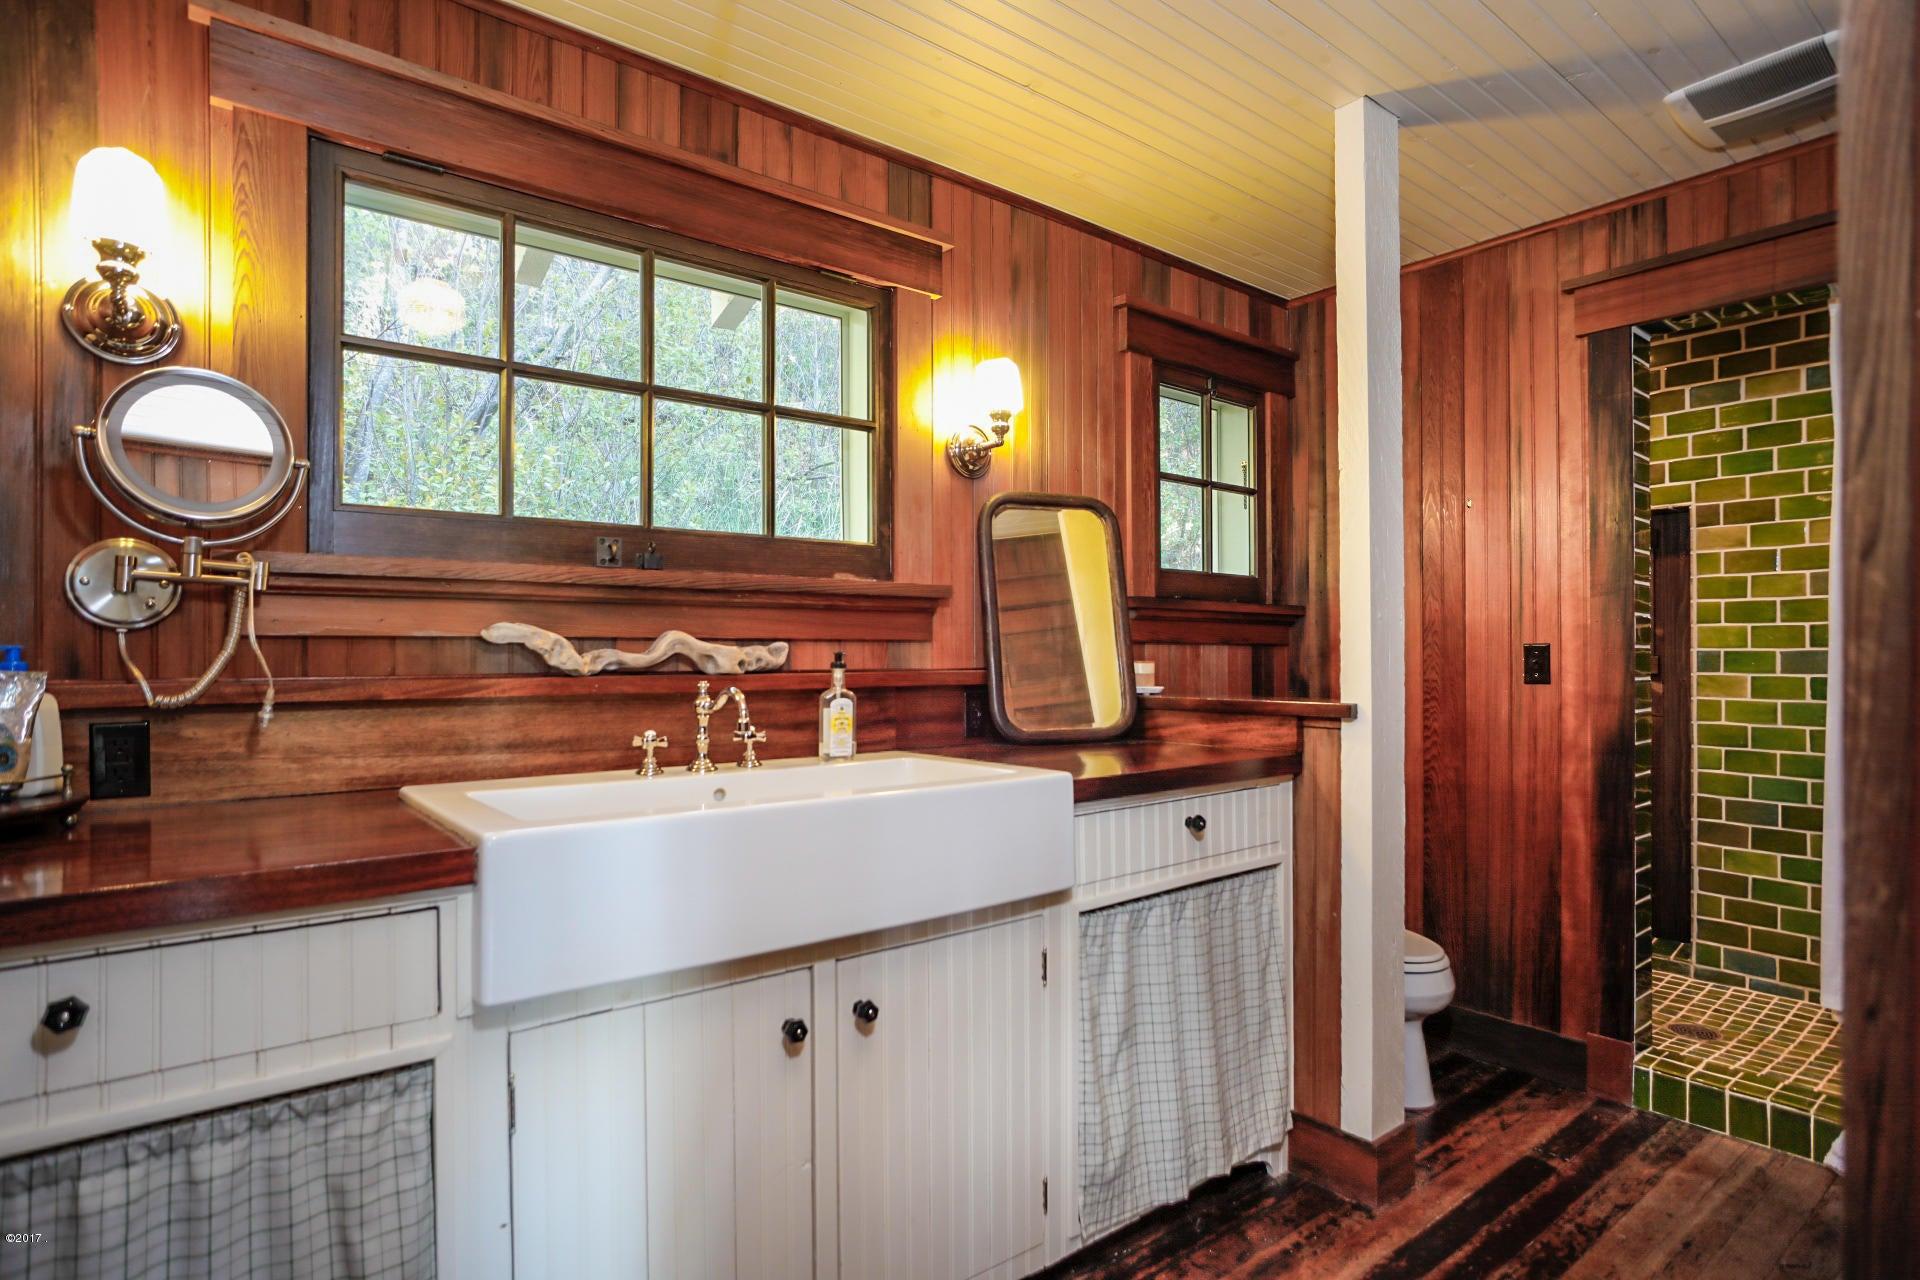 Additional photo for property listing at 240 Holt Drive  Bigfork, Montana 59911 United States